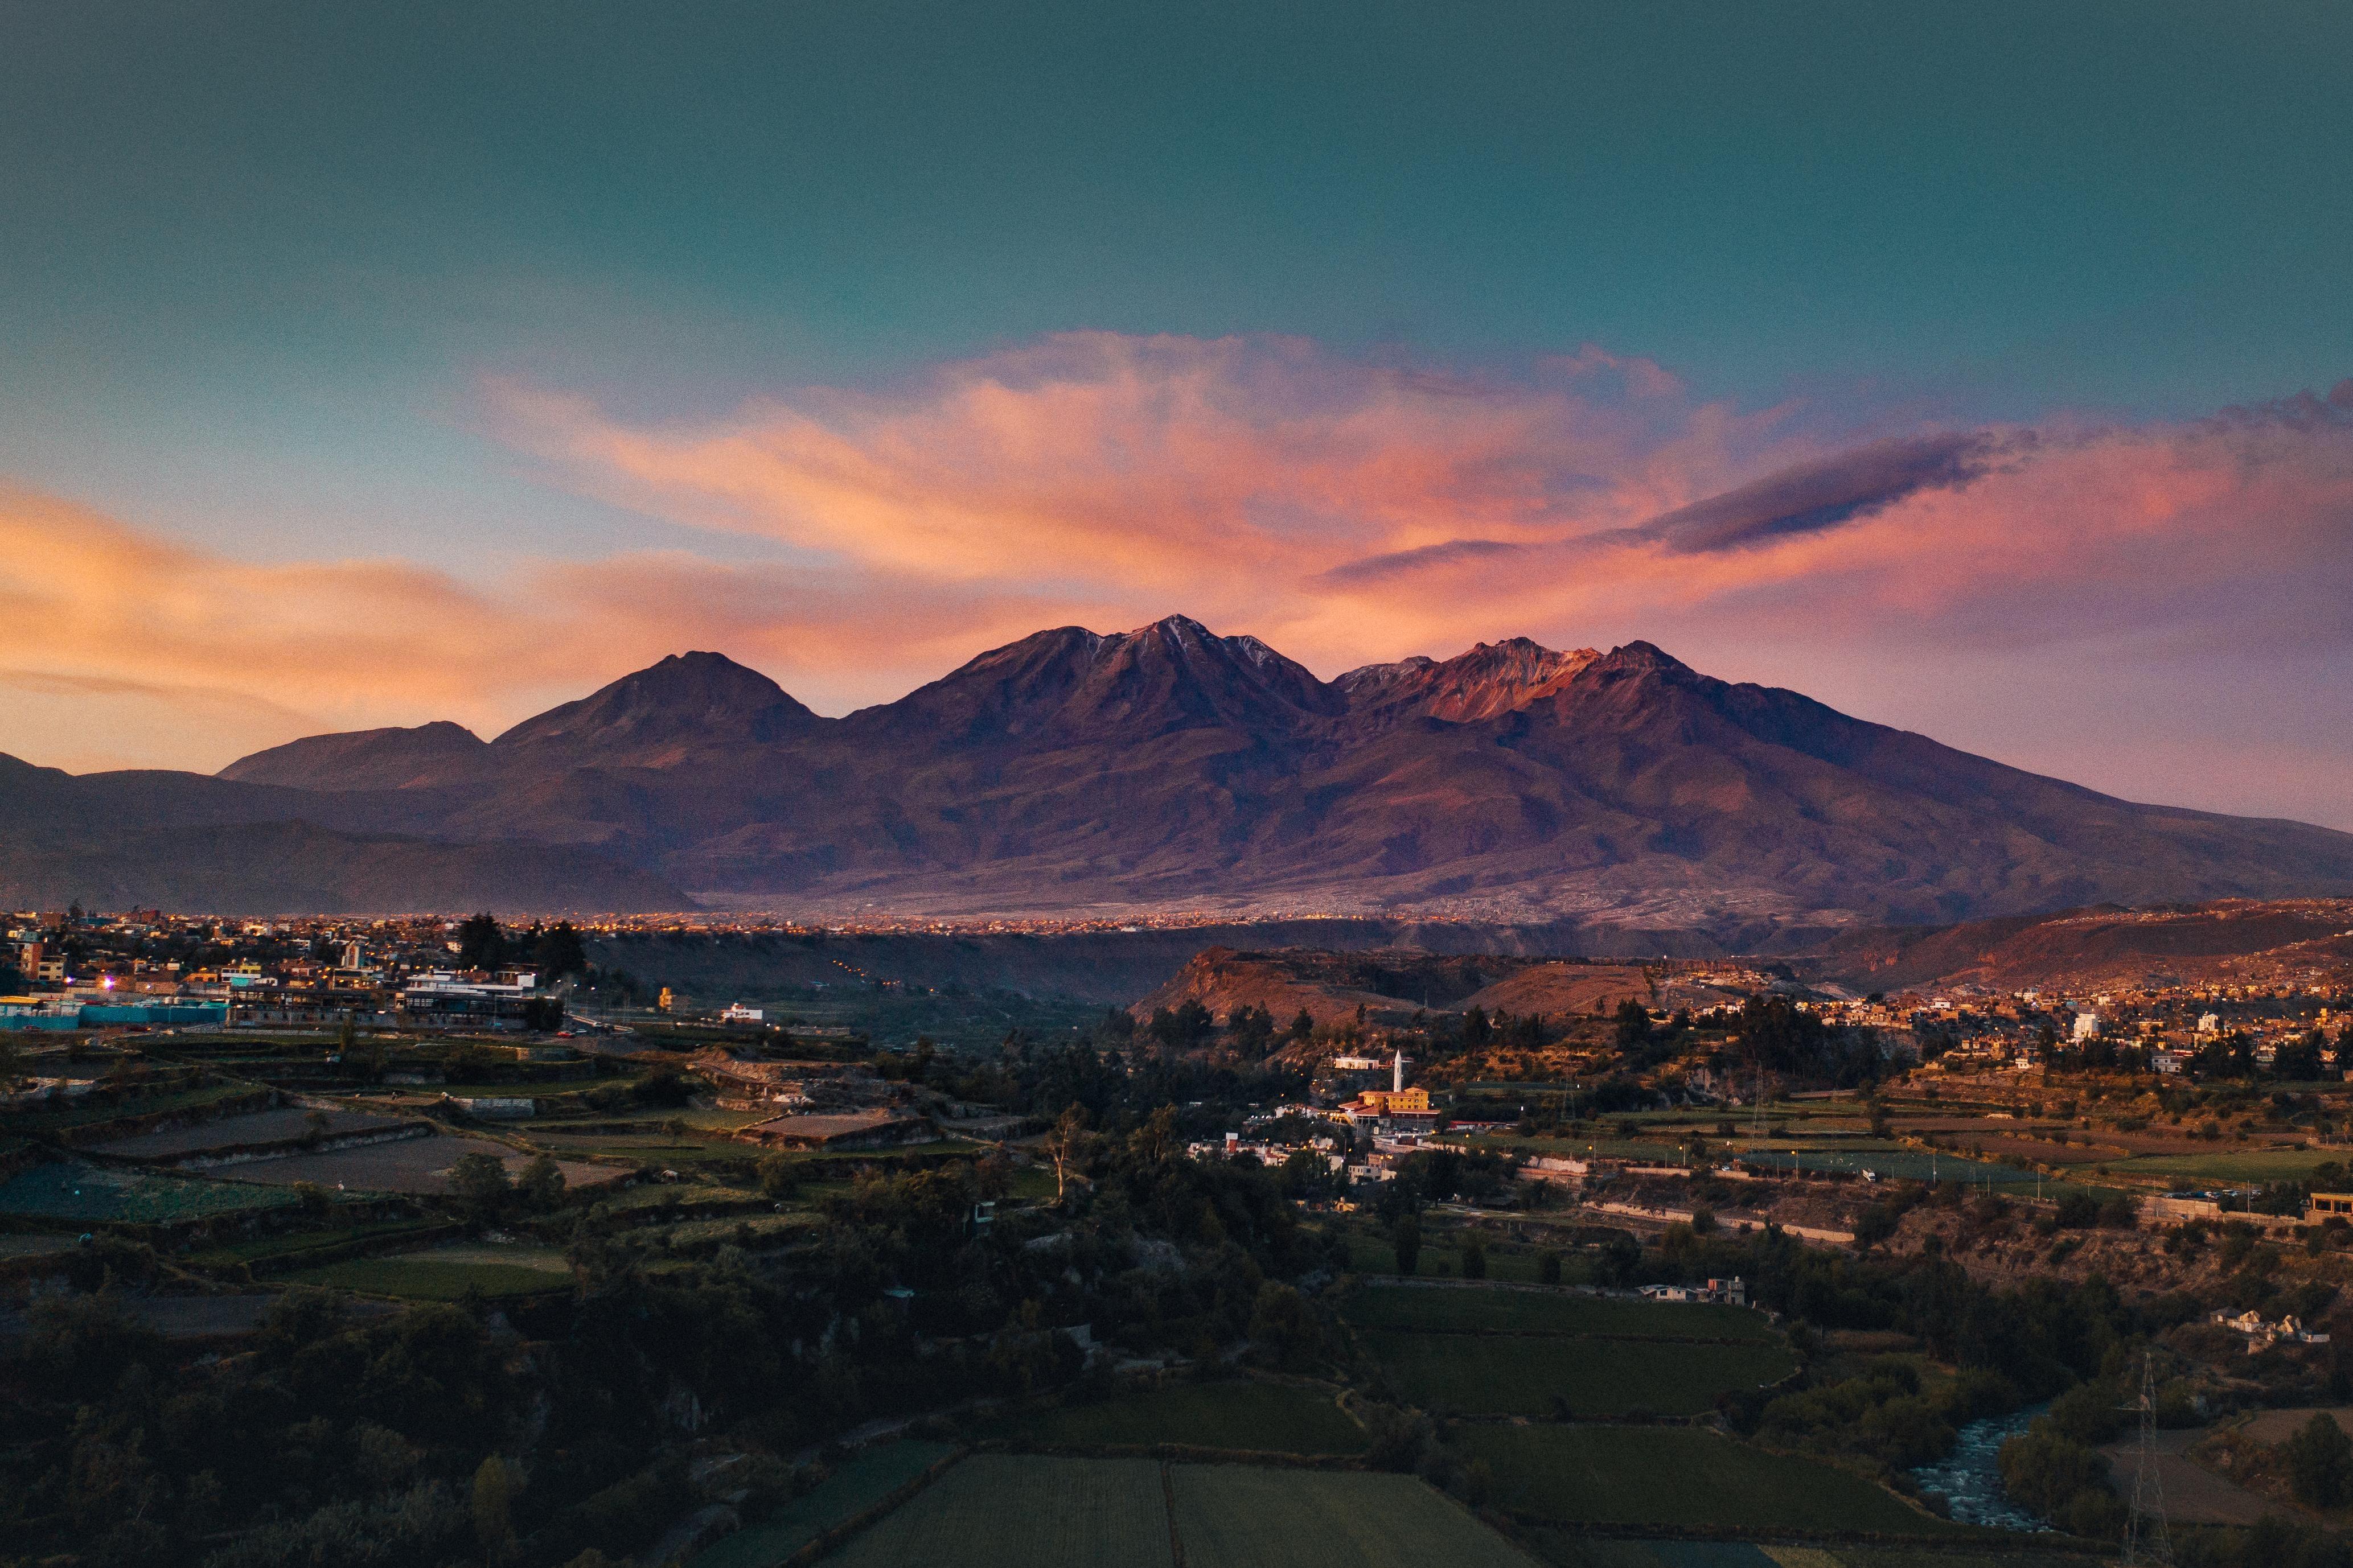 Chachani Volcano in Puno